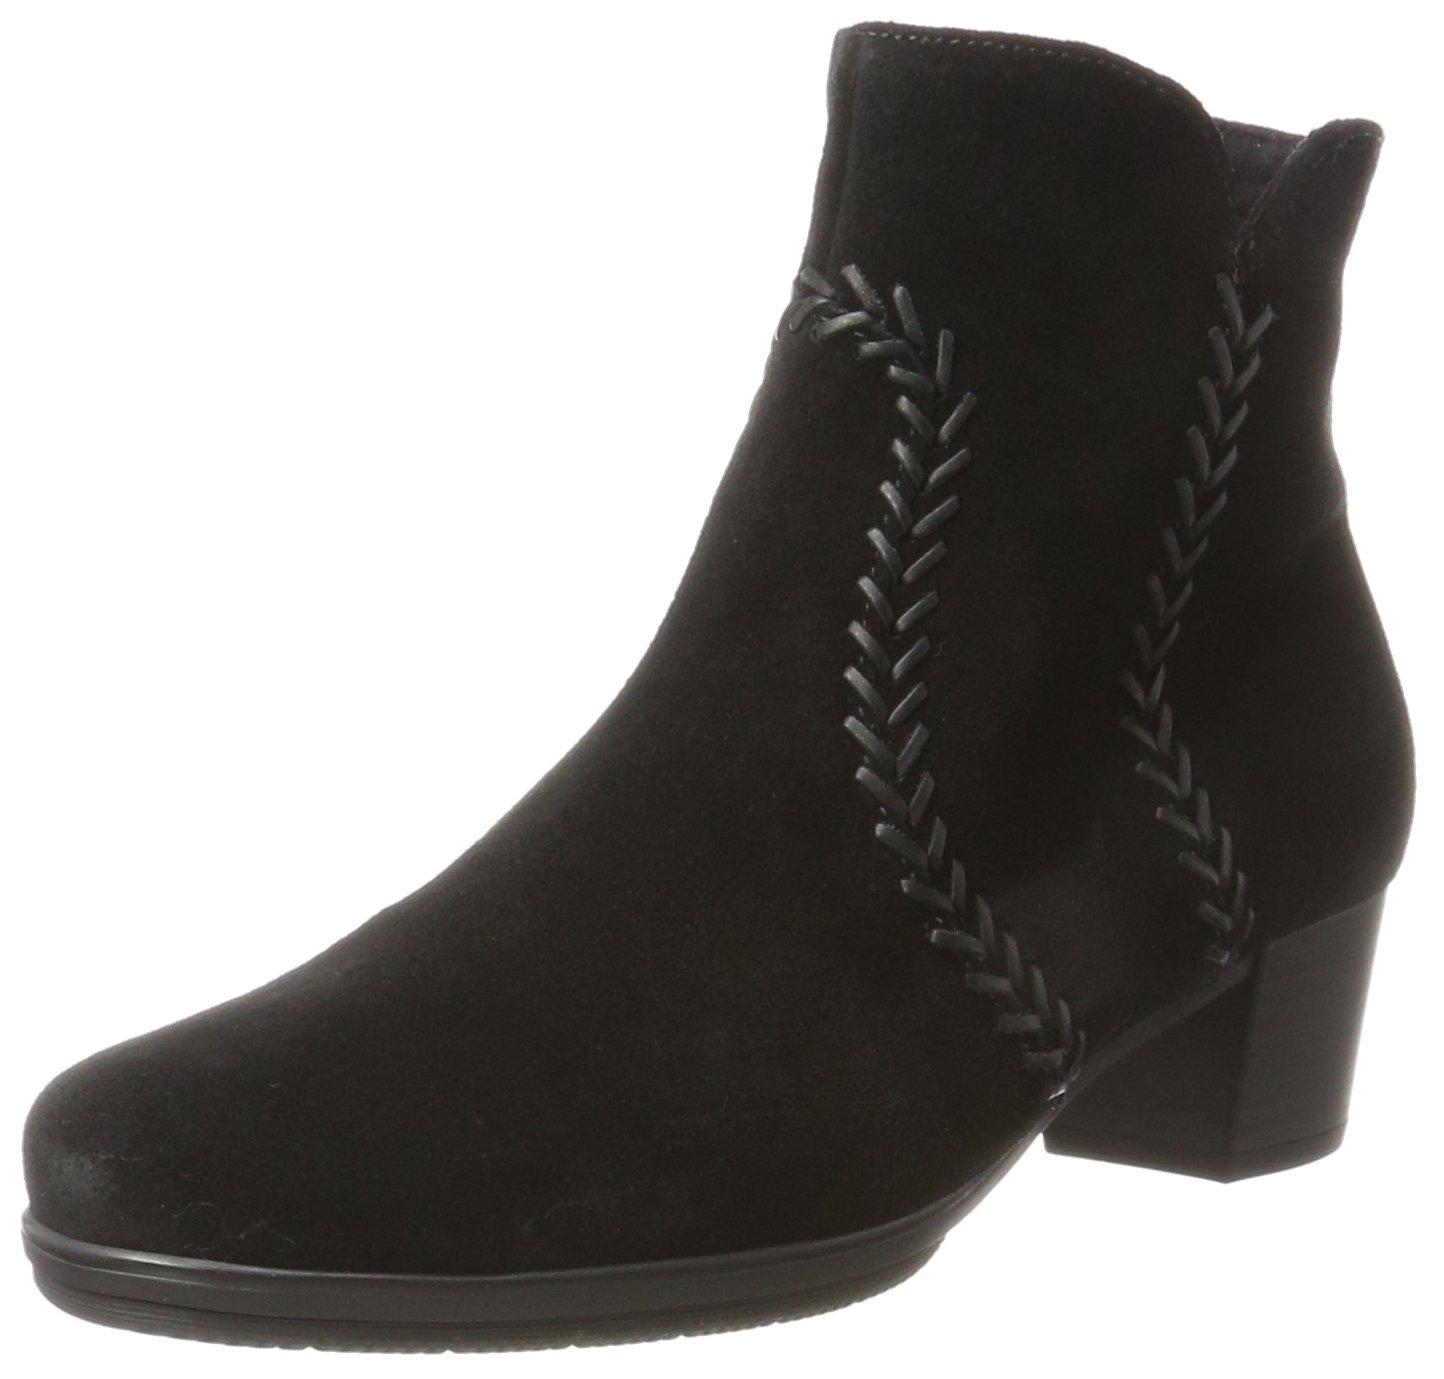 Gabor Shoes Gabor Bottes Basic, (17 Schwarz) Bottes Femme Noir (17 Schwarz) 77d6396 - robotanarchy.space